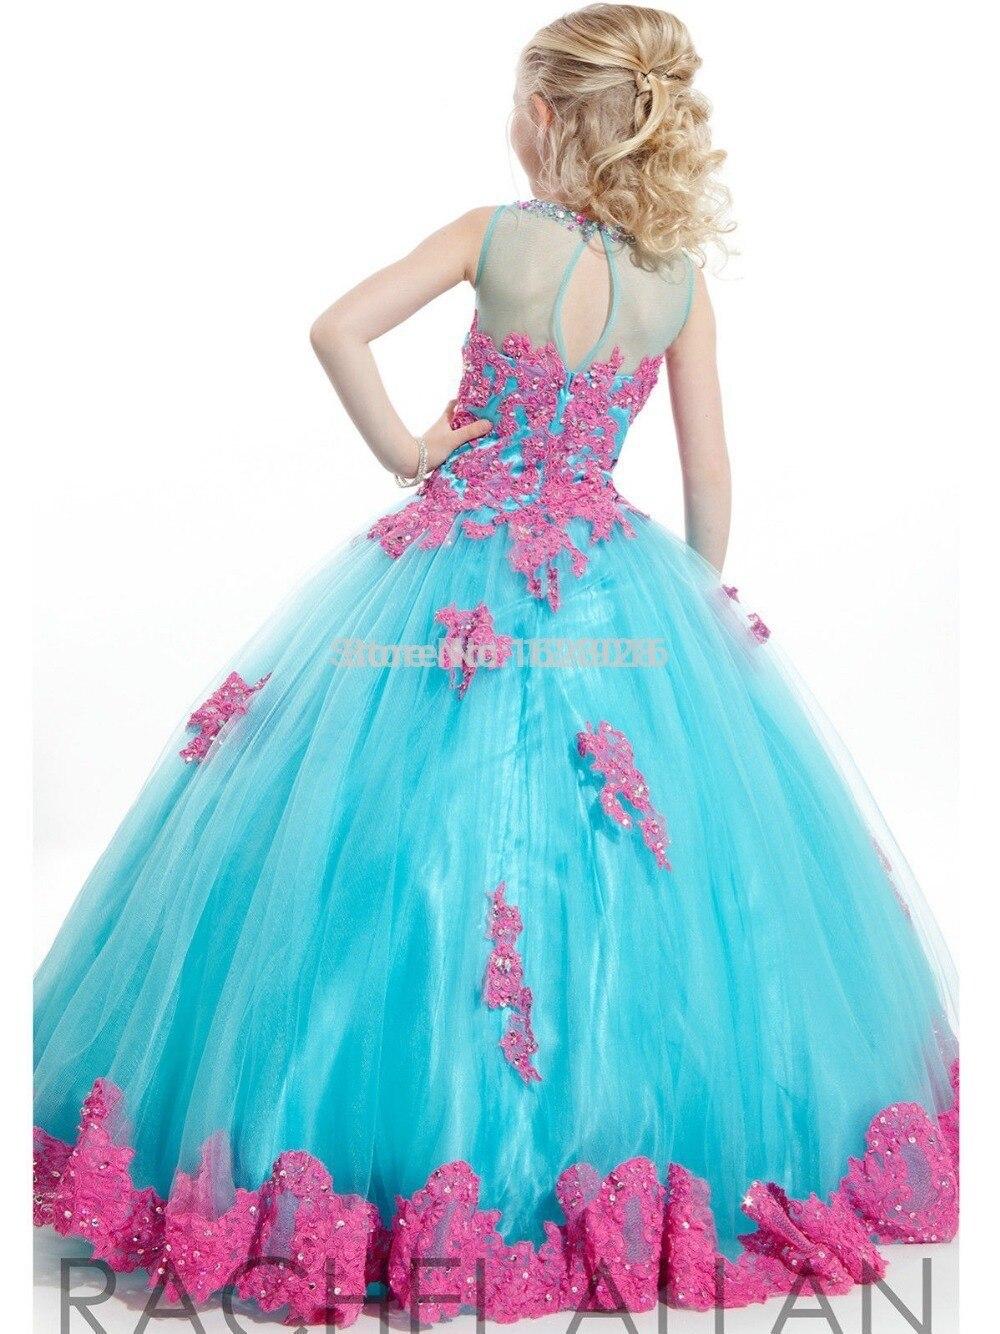 Nett Monsoon Kids Bridesmaid Dresses Fotos - Brautkleider Ideen ...